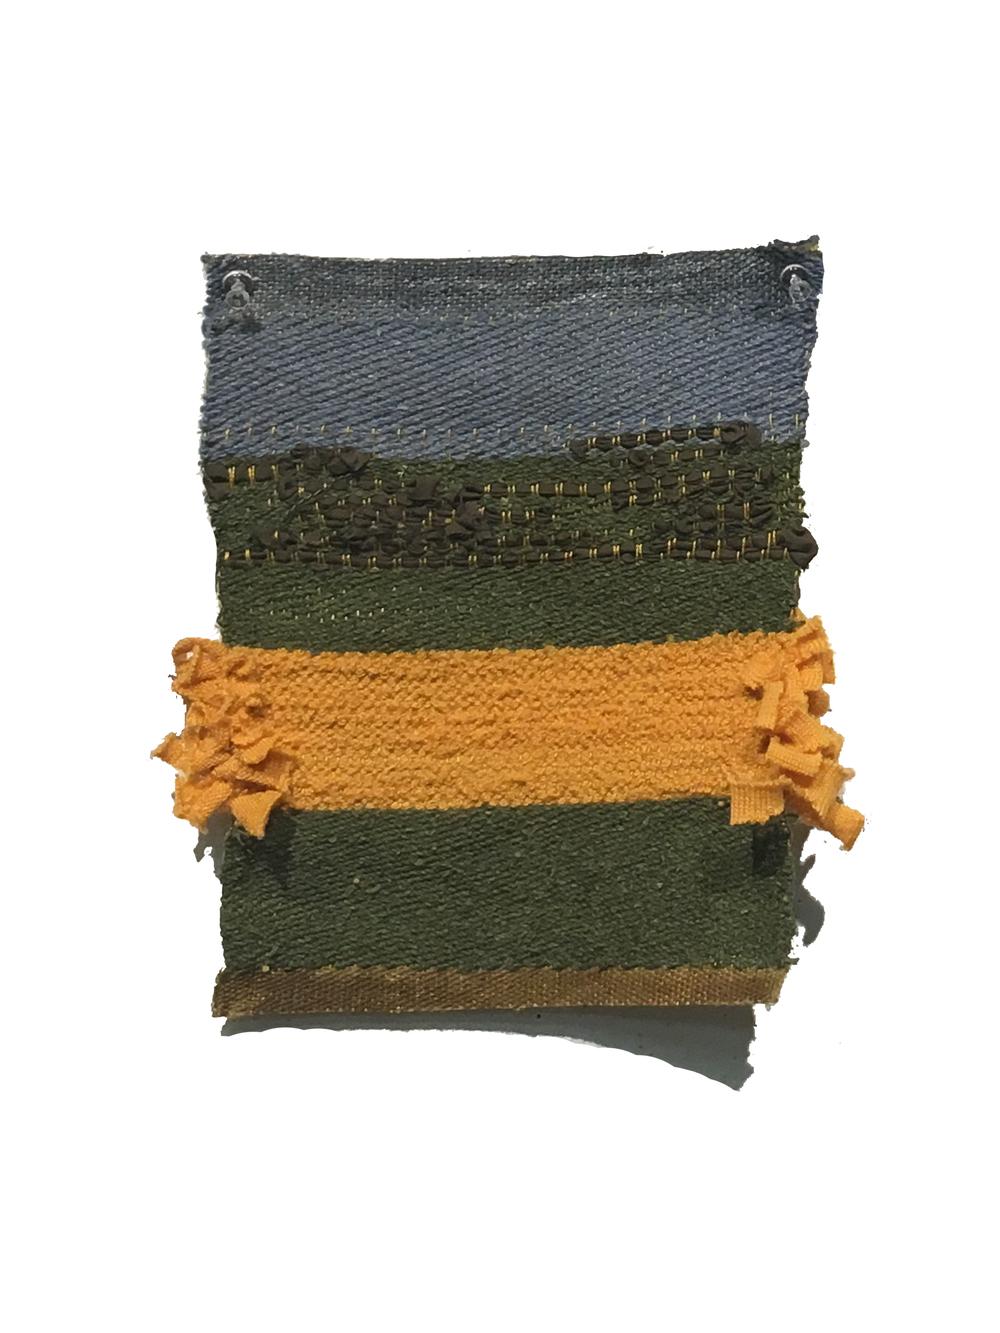 weaving1-sample3.jpg